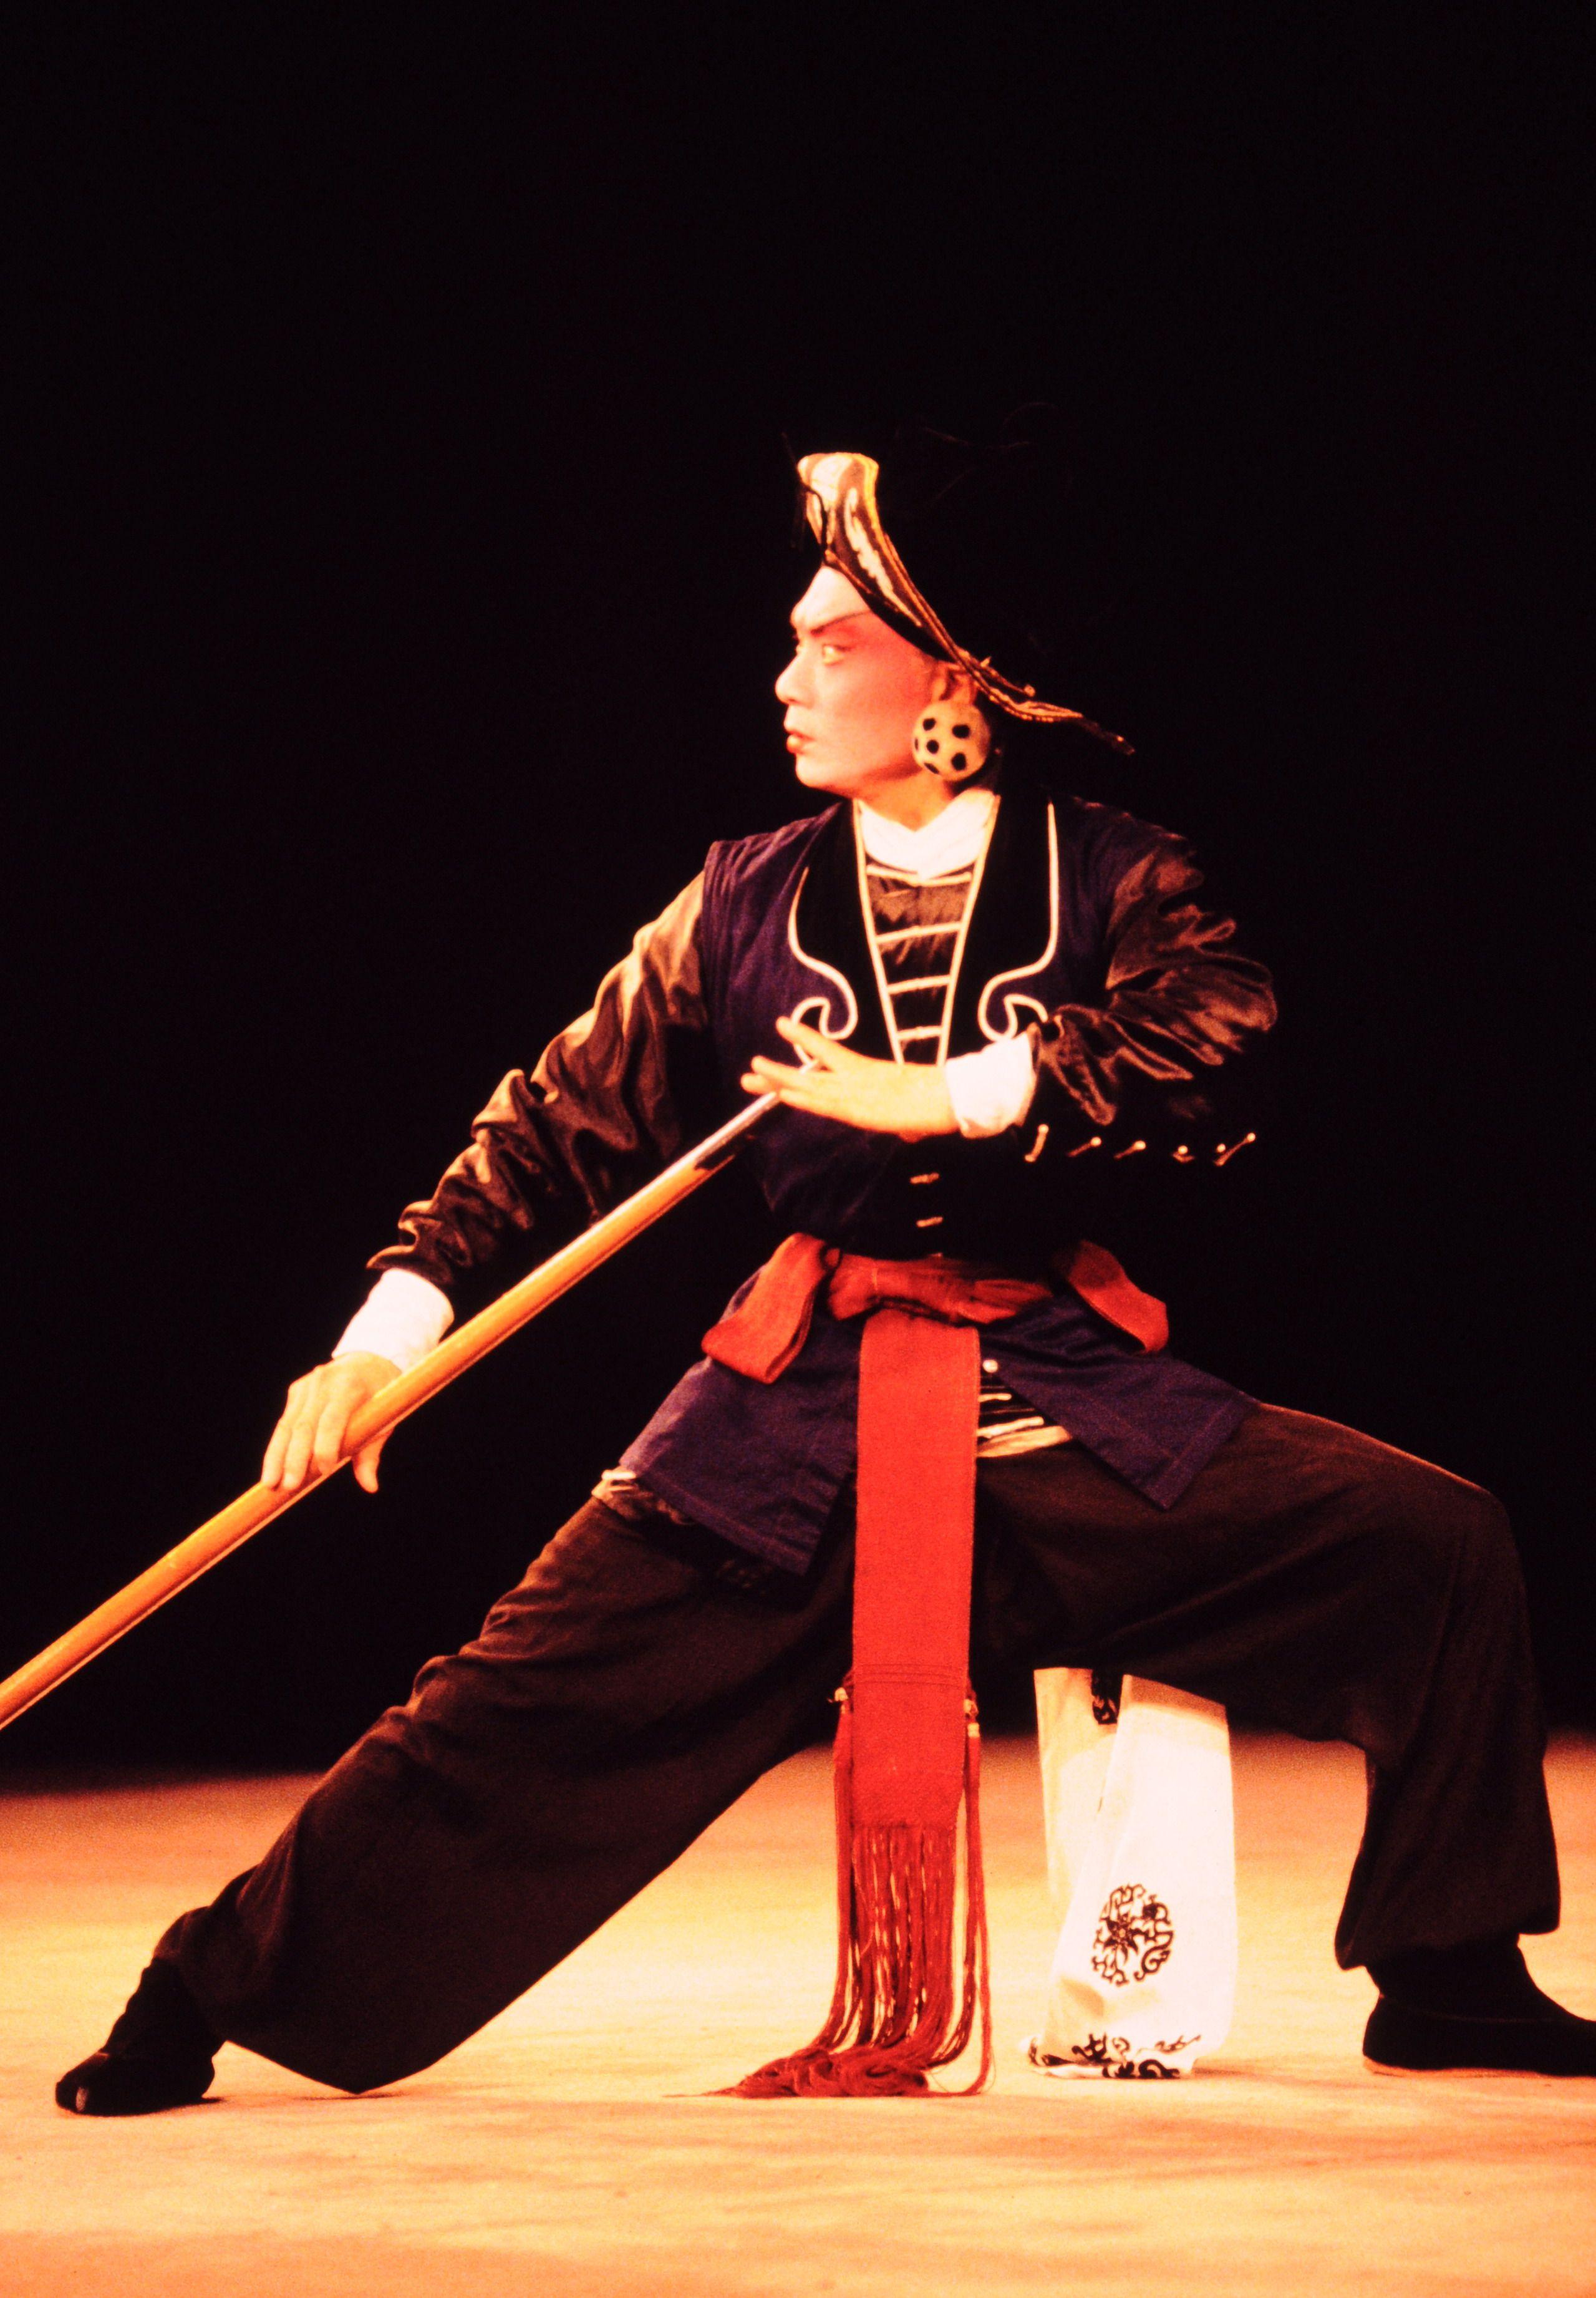 peking opera Definitions of peking opera, synonyms, antonyms, derivatives of peking opera, analogical dictionary of peking opera (english.